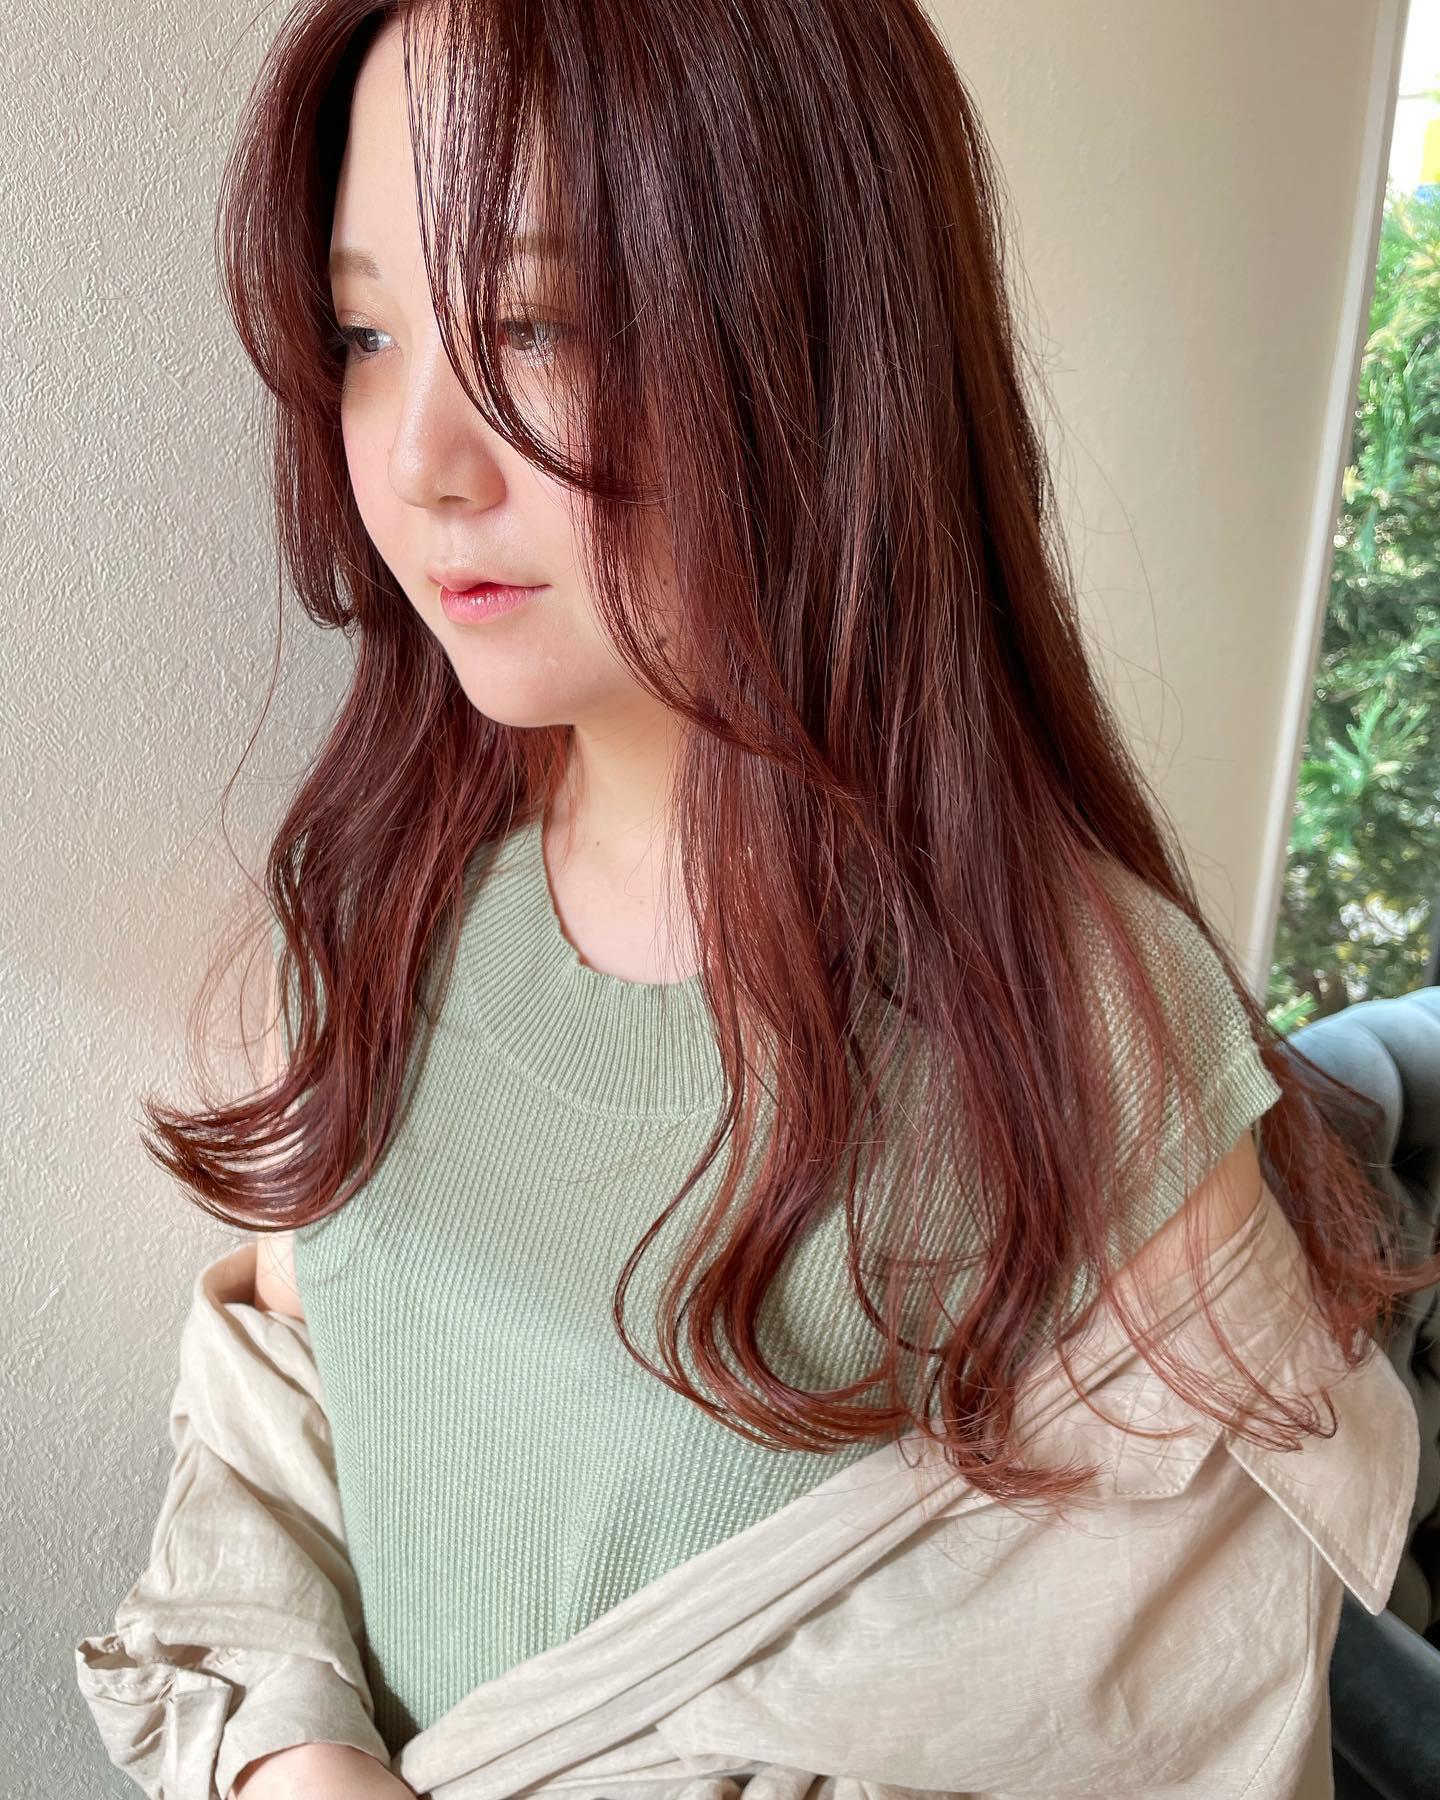 hair ... TOMMY ︎red orange @abond_tommy @heartyabond#tommy_hair#heartyabond#abond#カラー#ヘアカラー#アボンド#高崎#高崎美容室#群馬#群馬美容室